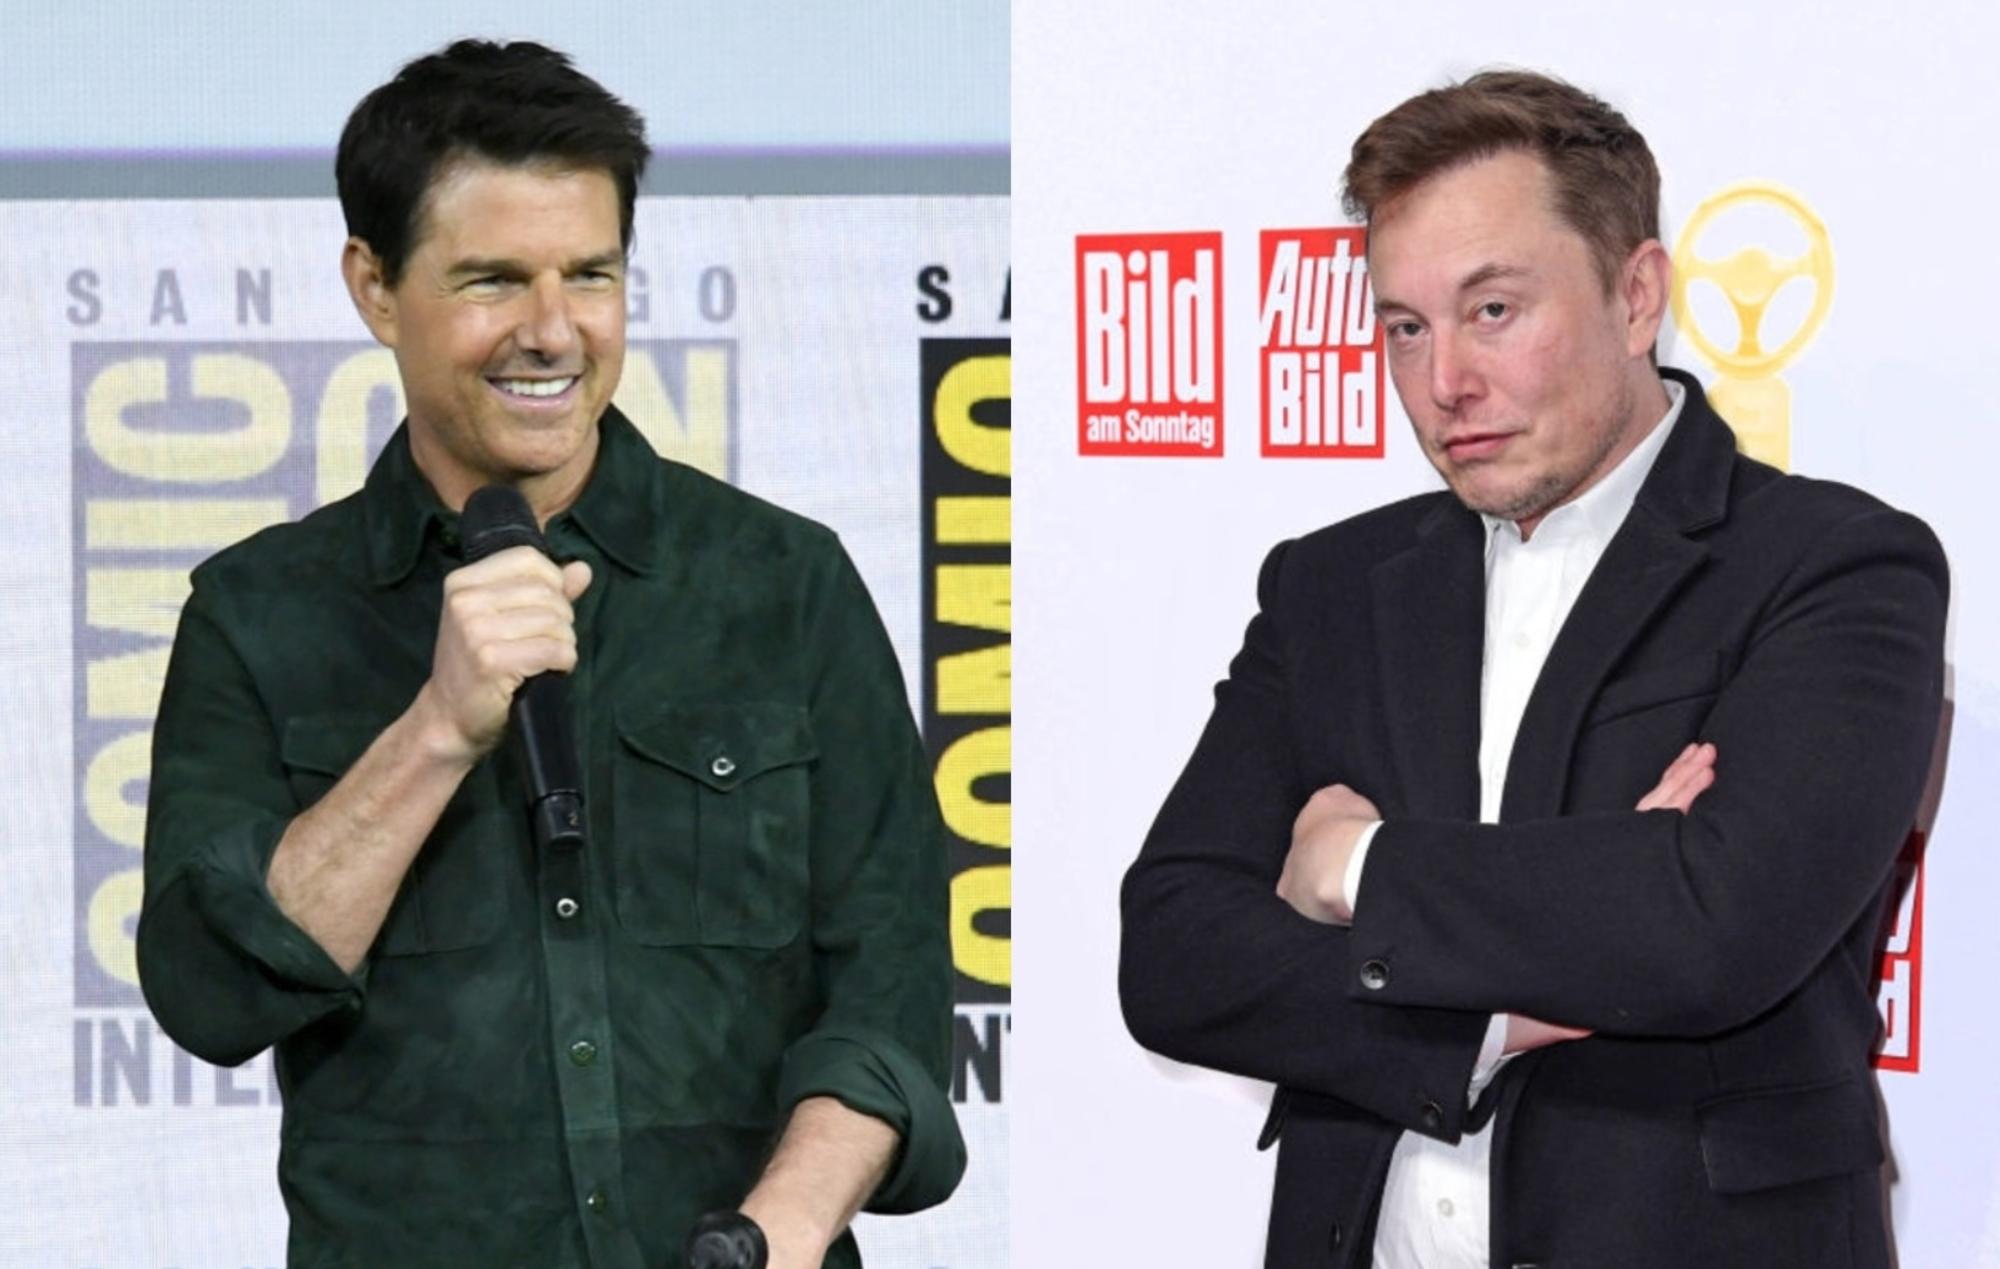 Tom Cruise and Elon Musk